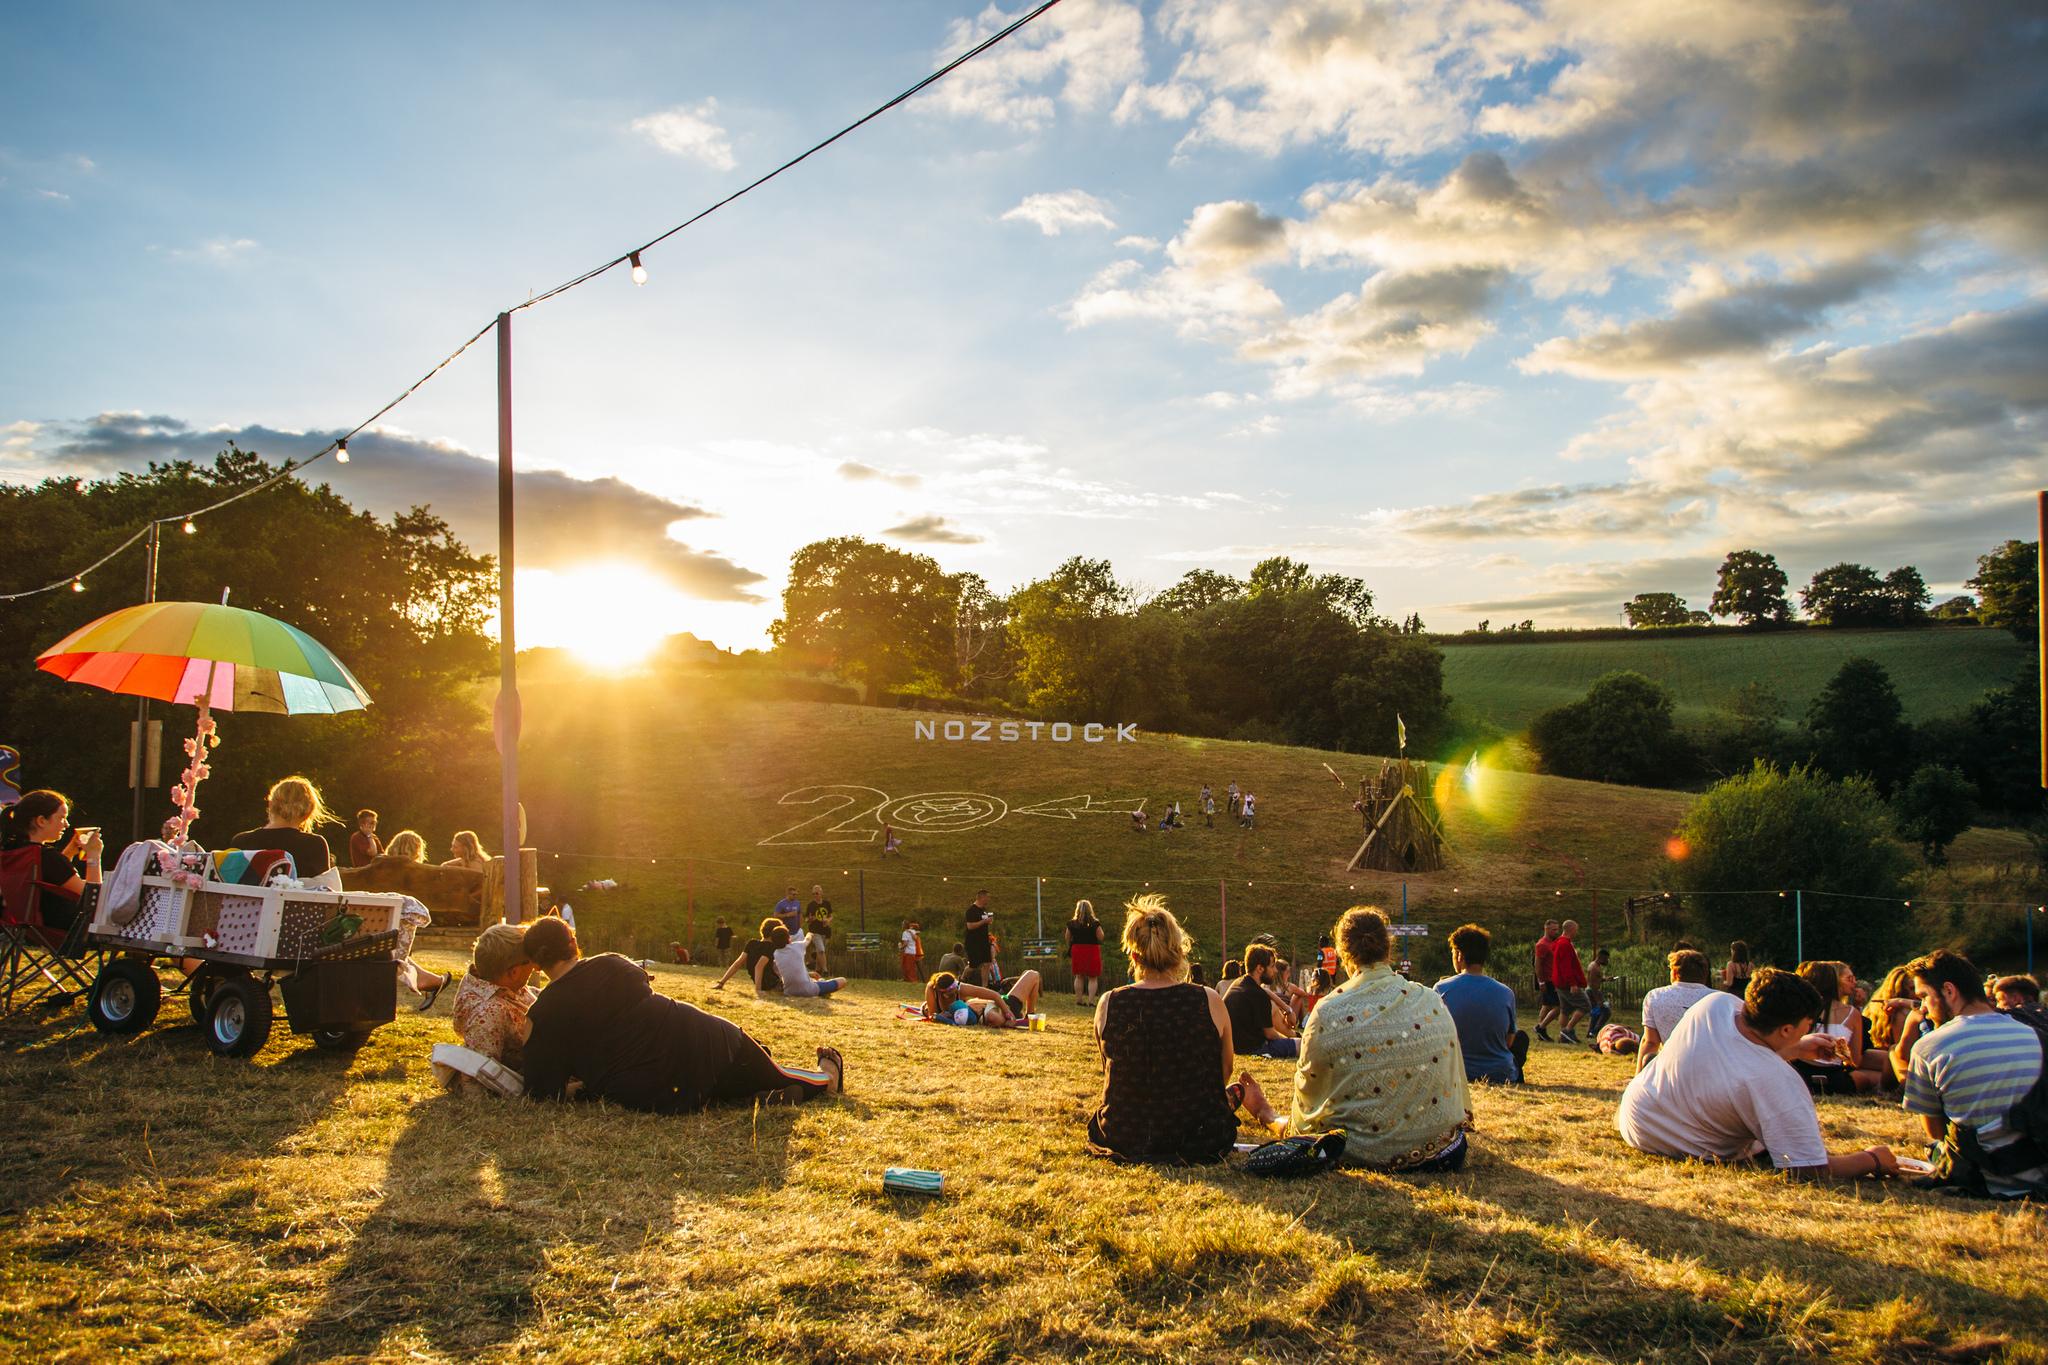 Nozstock 2018 sunset - credit Chloe Knott